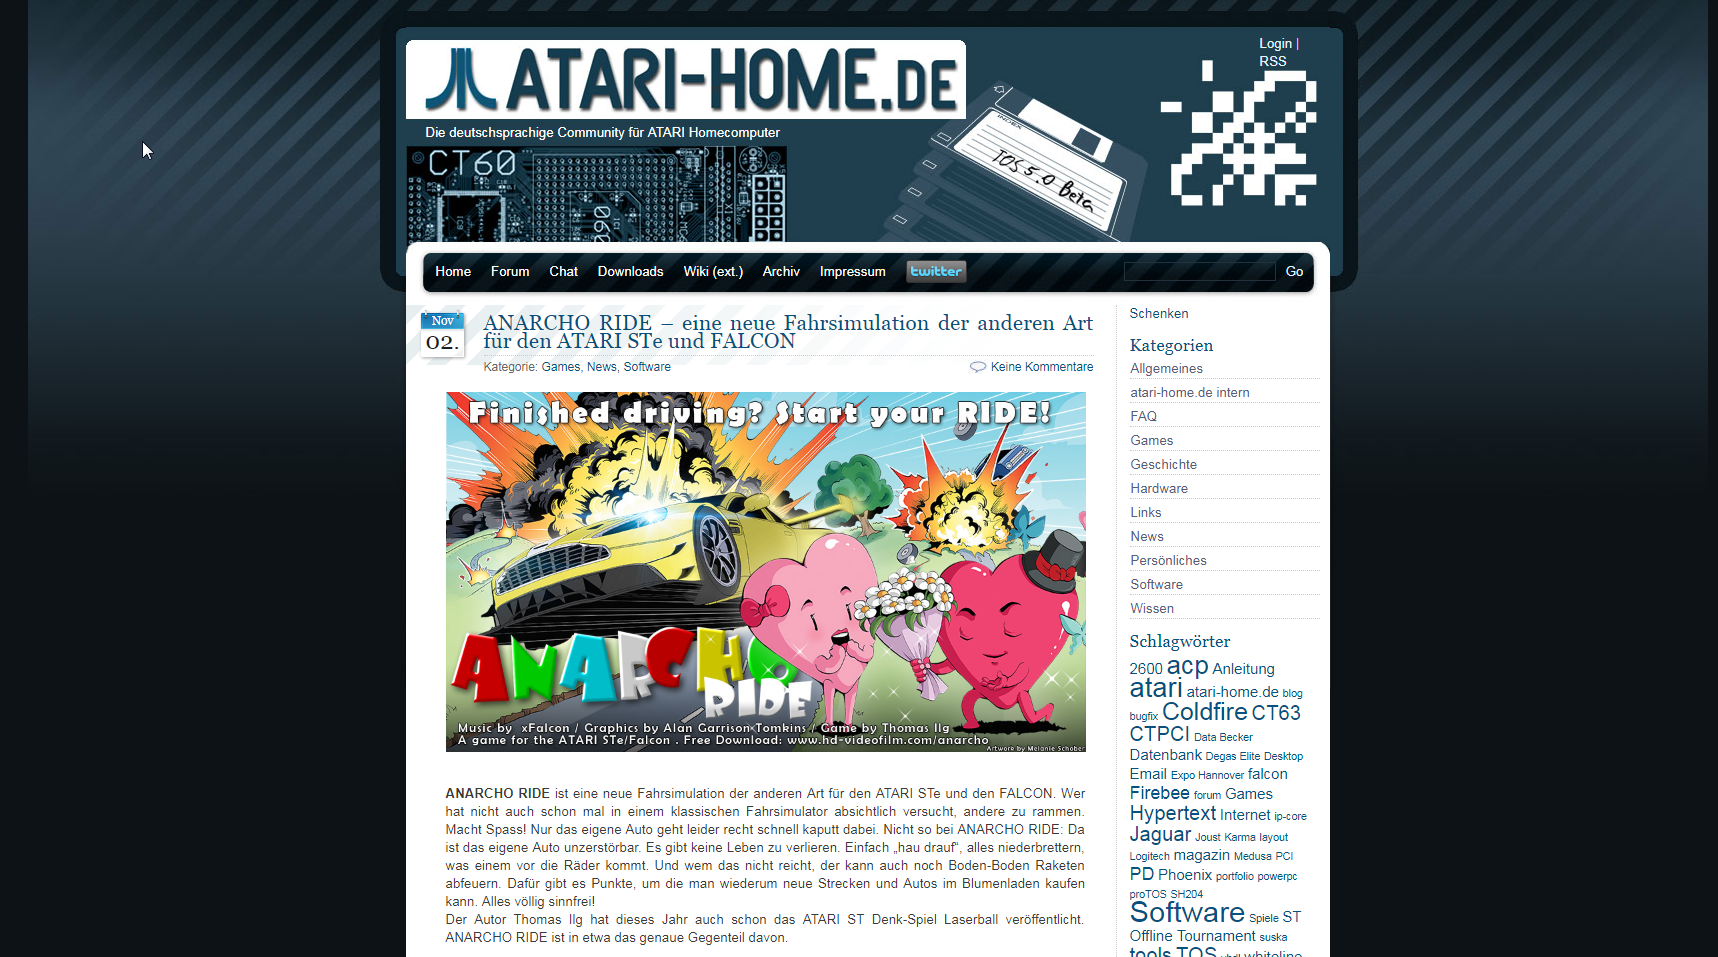 Screenshot of website Atari Home